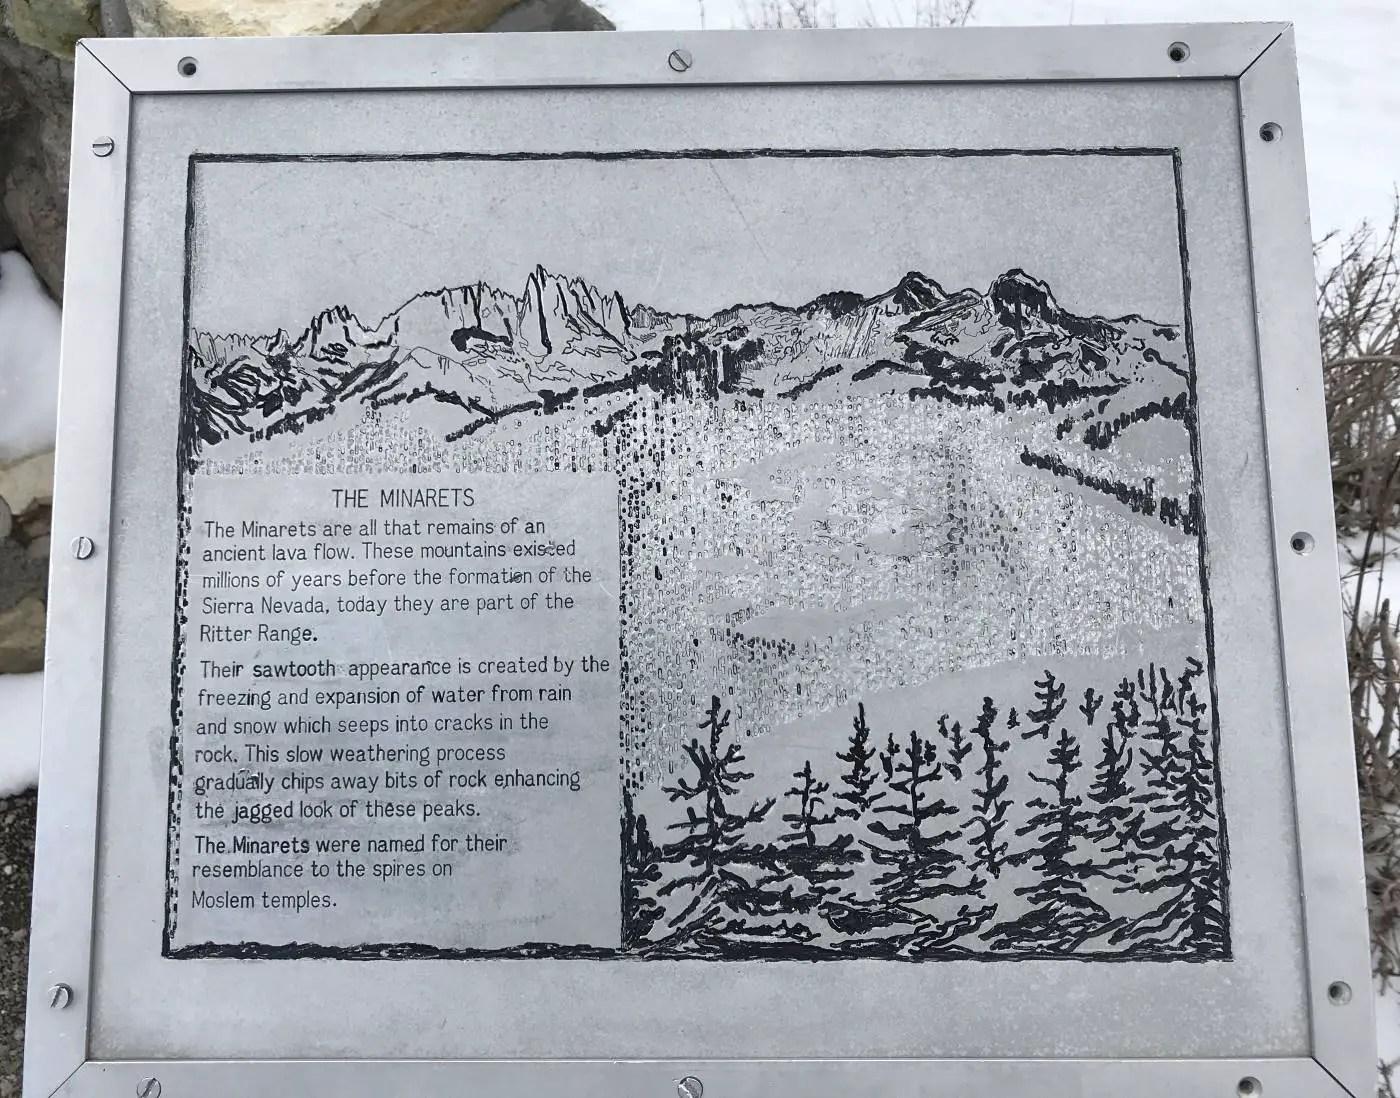 The Minarets plaque